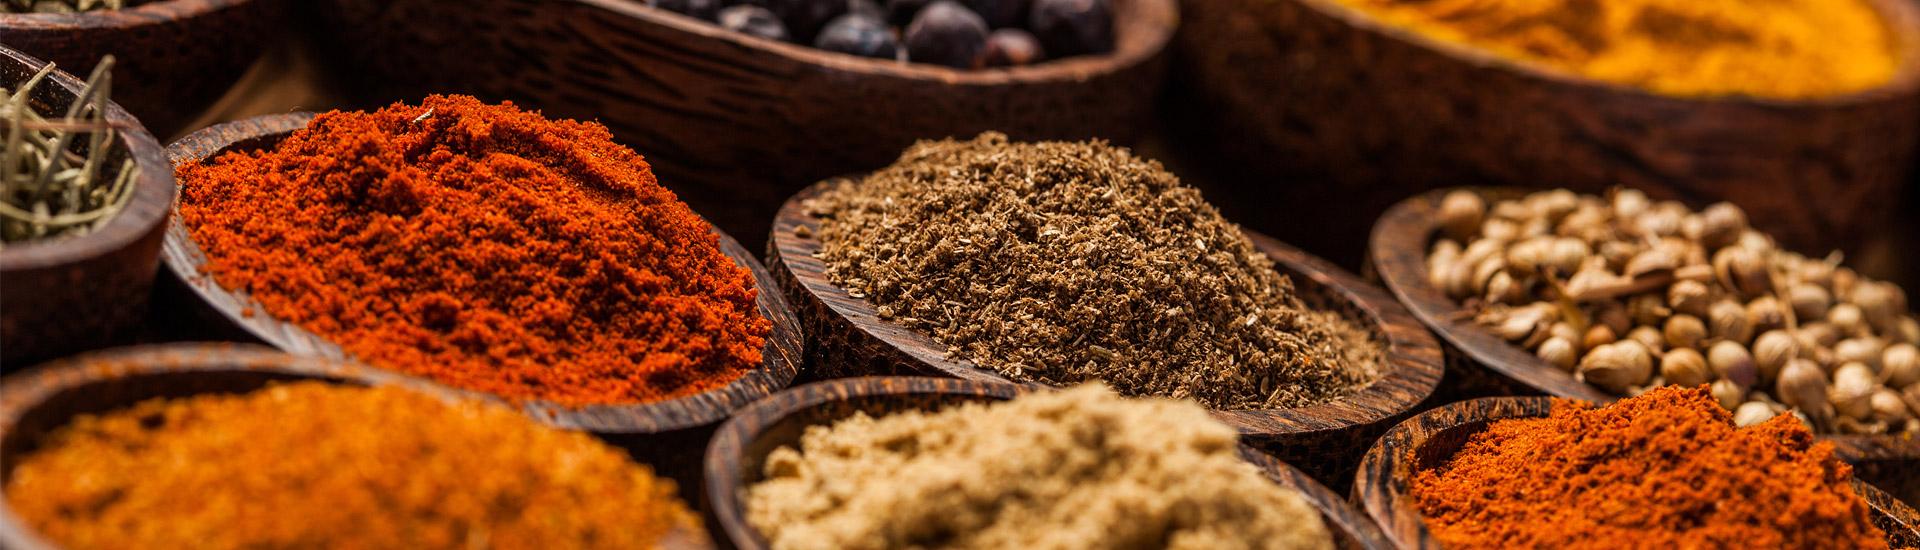 Kryddor påsar